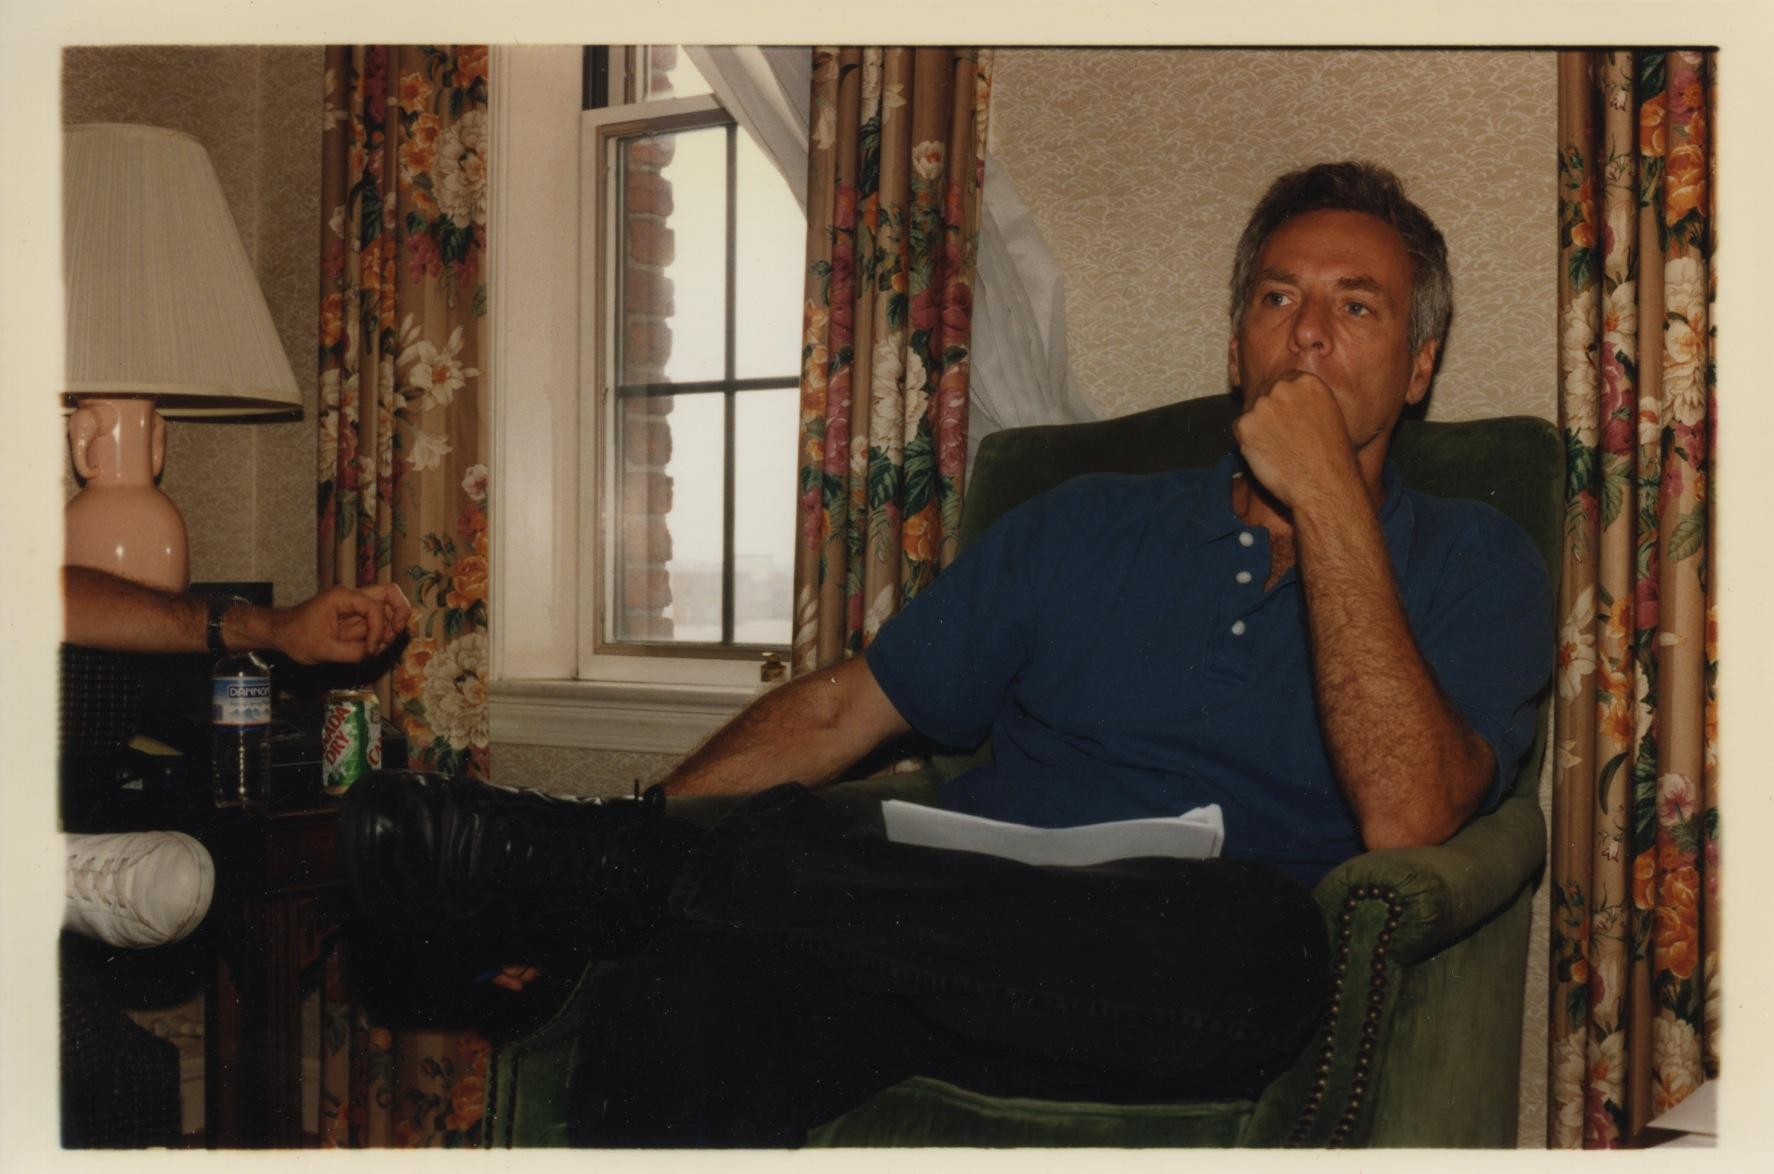 Pensive Marc